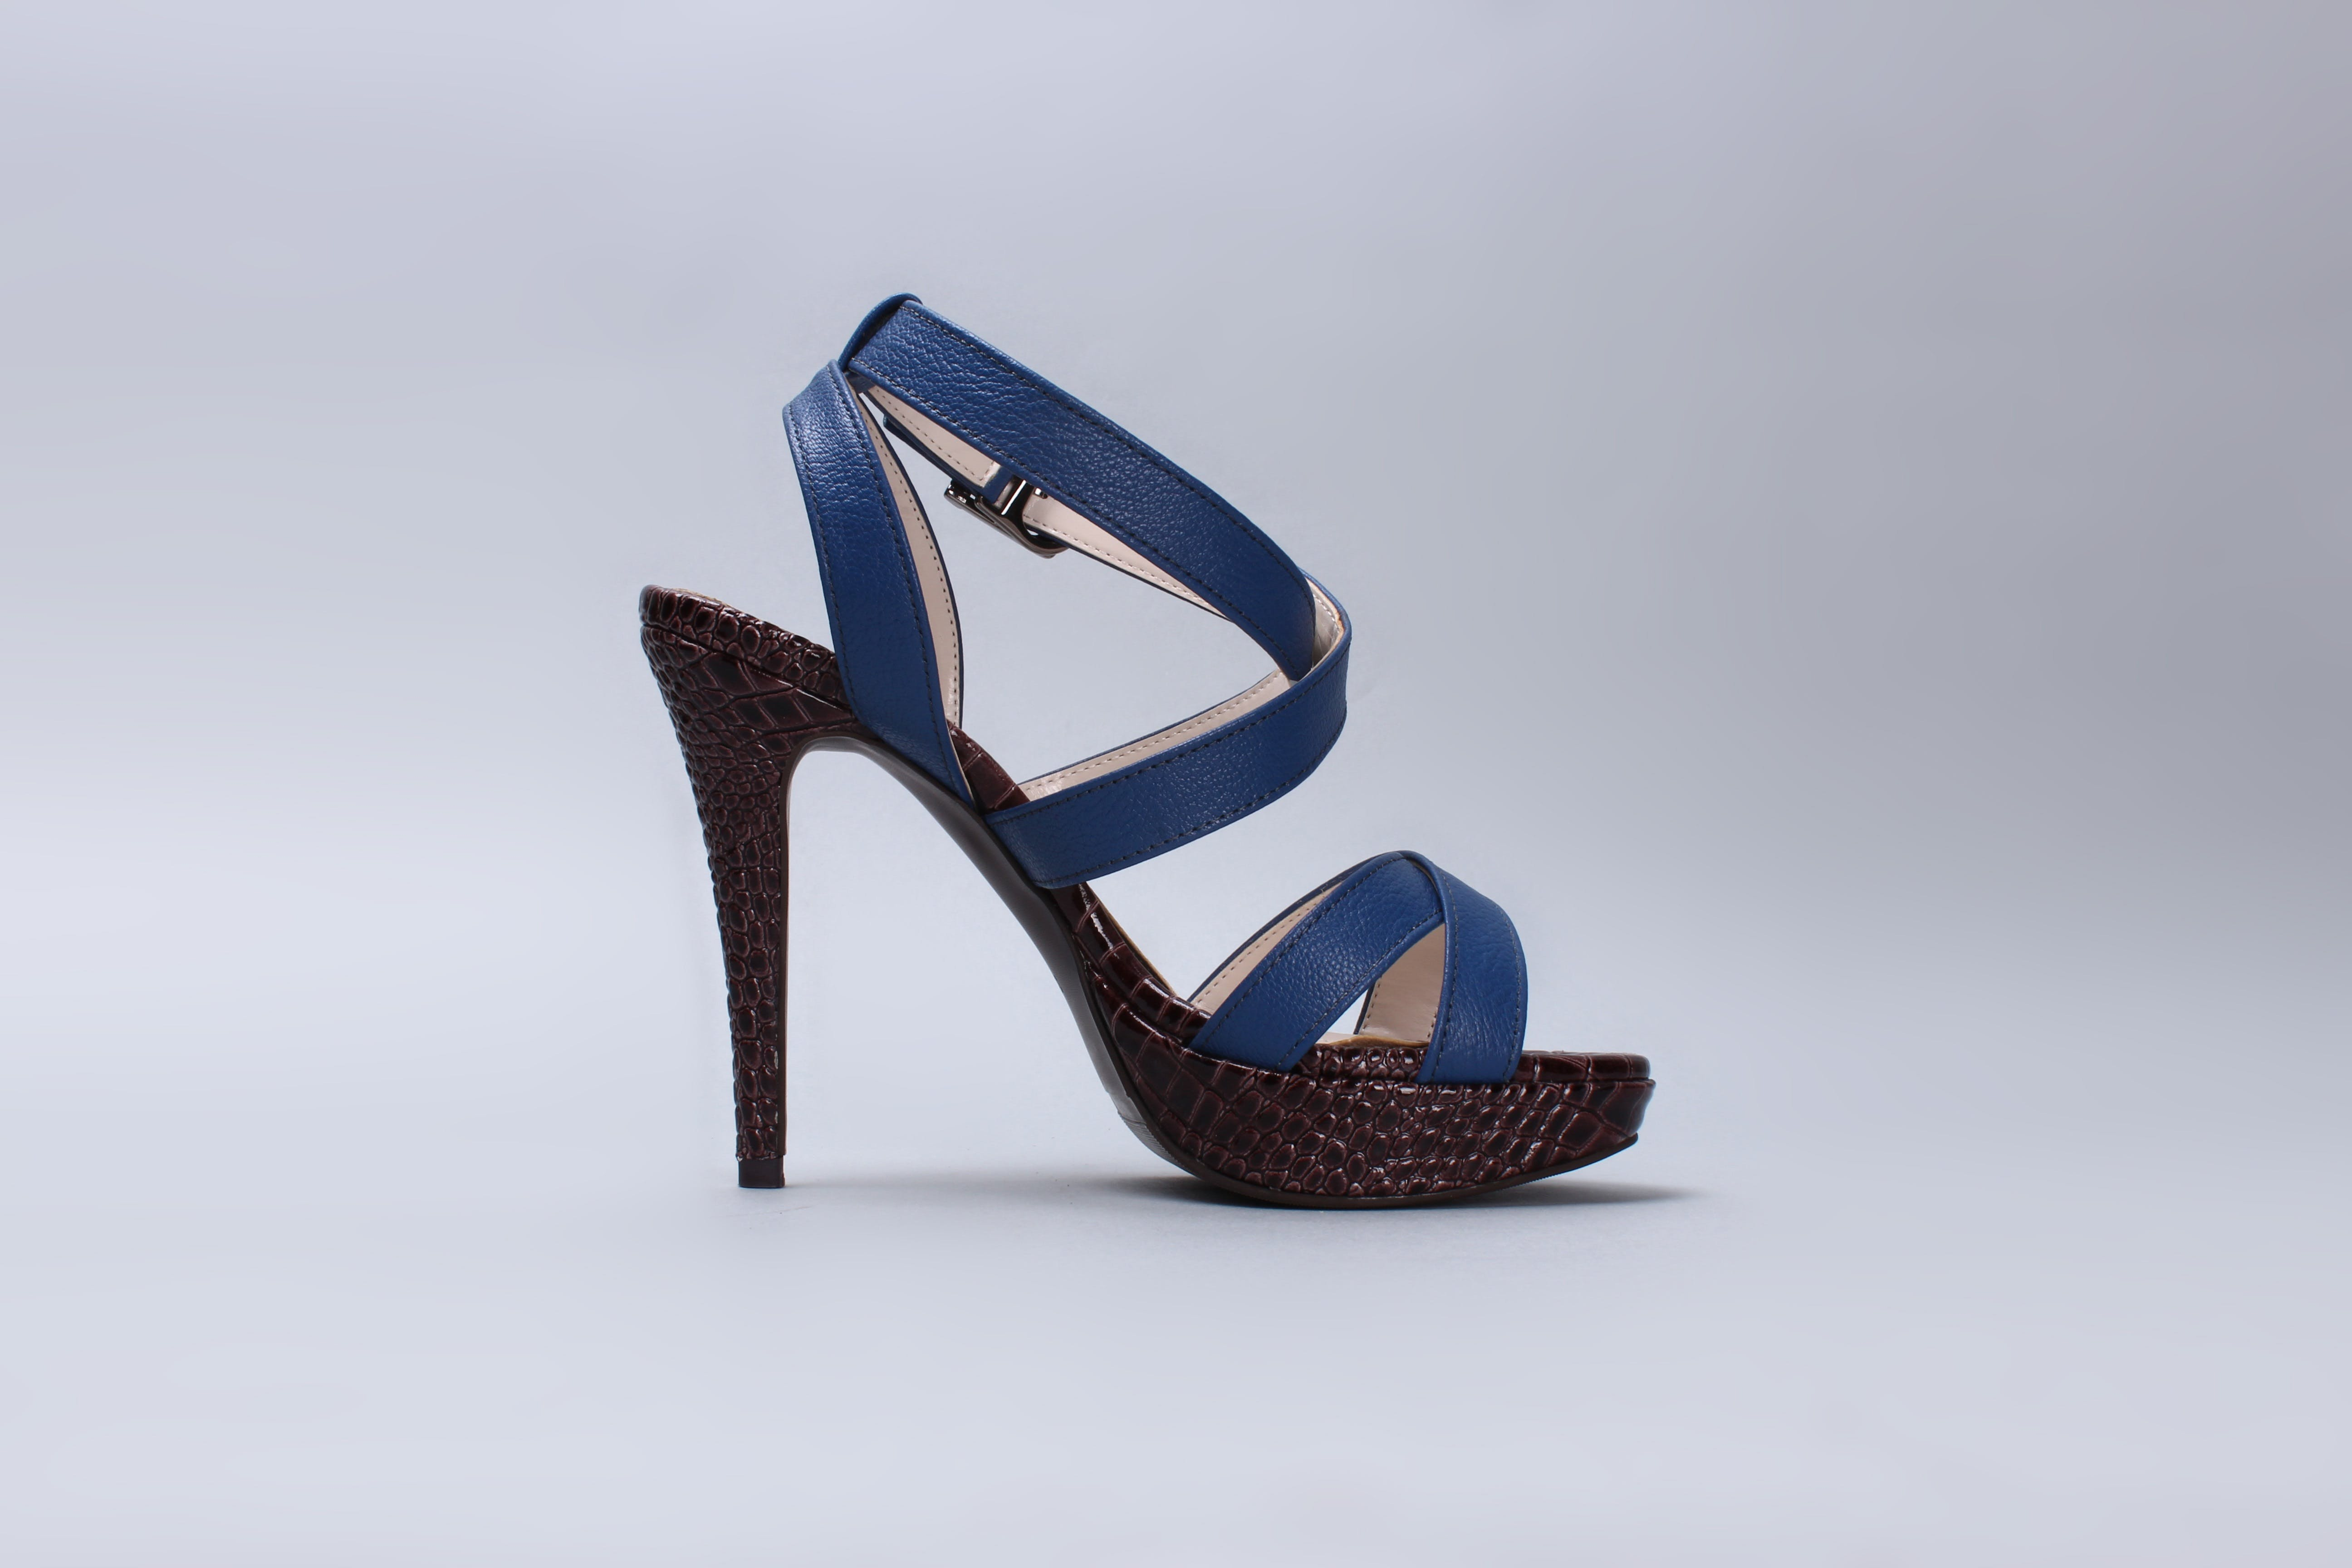 Blue Leather Ankle Strap Black Heeled Sandals